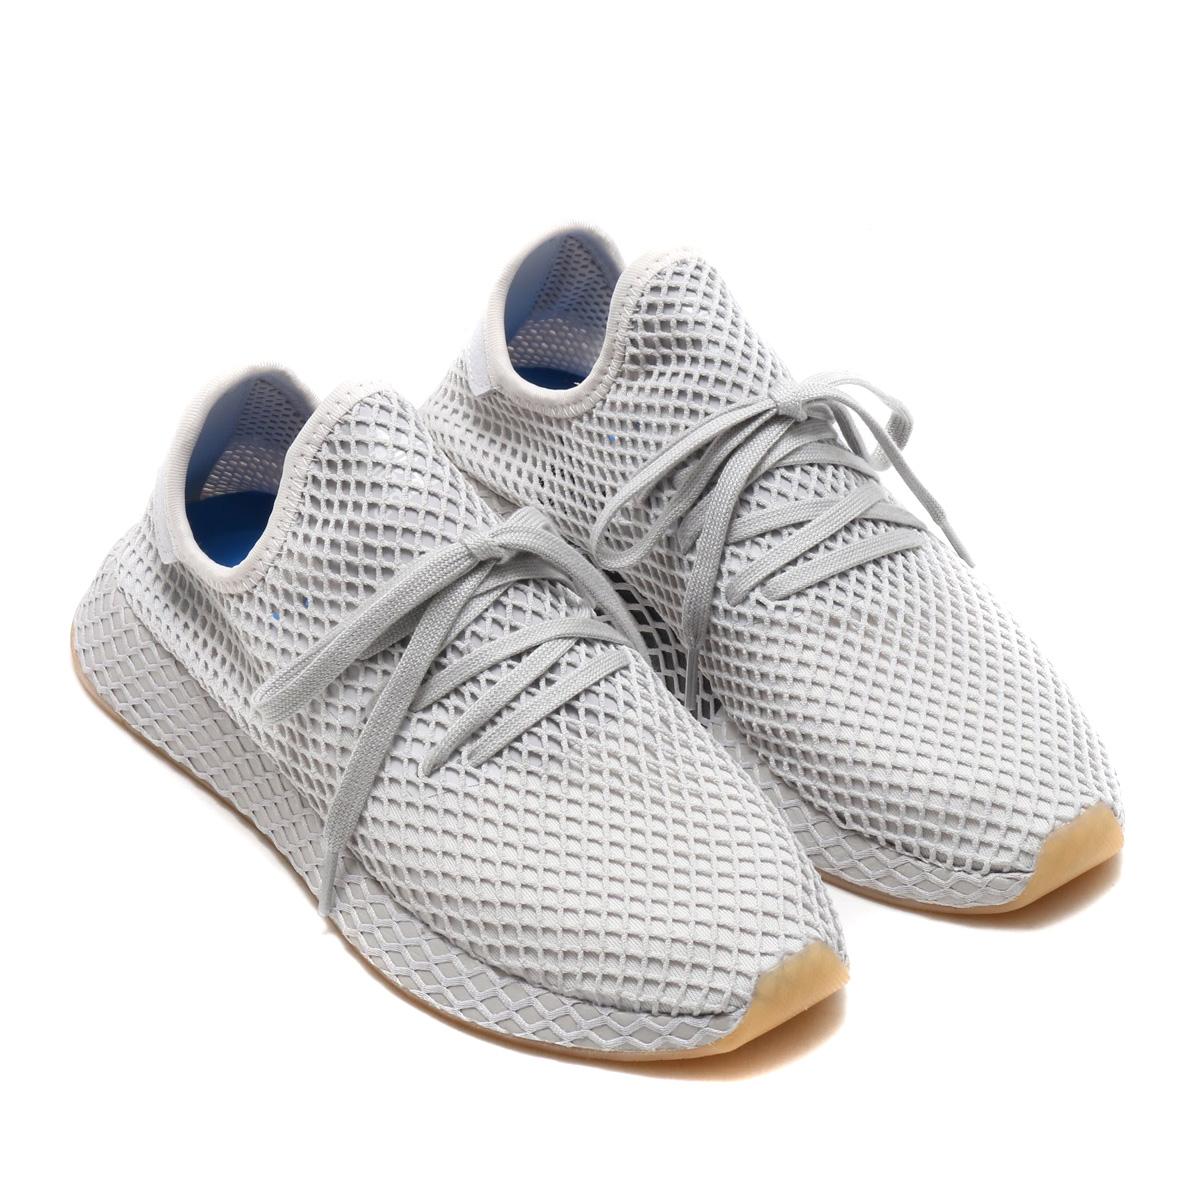 adidas Originals DEERUPT RUNNER(アディダス オリジナルス ディーラプト ランナー)(グレースリーF17/LGH ソリッドグレー/ガム1)18SS-I